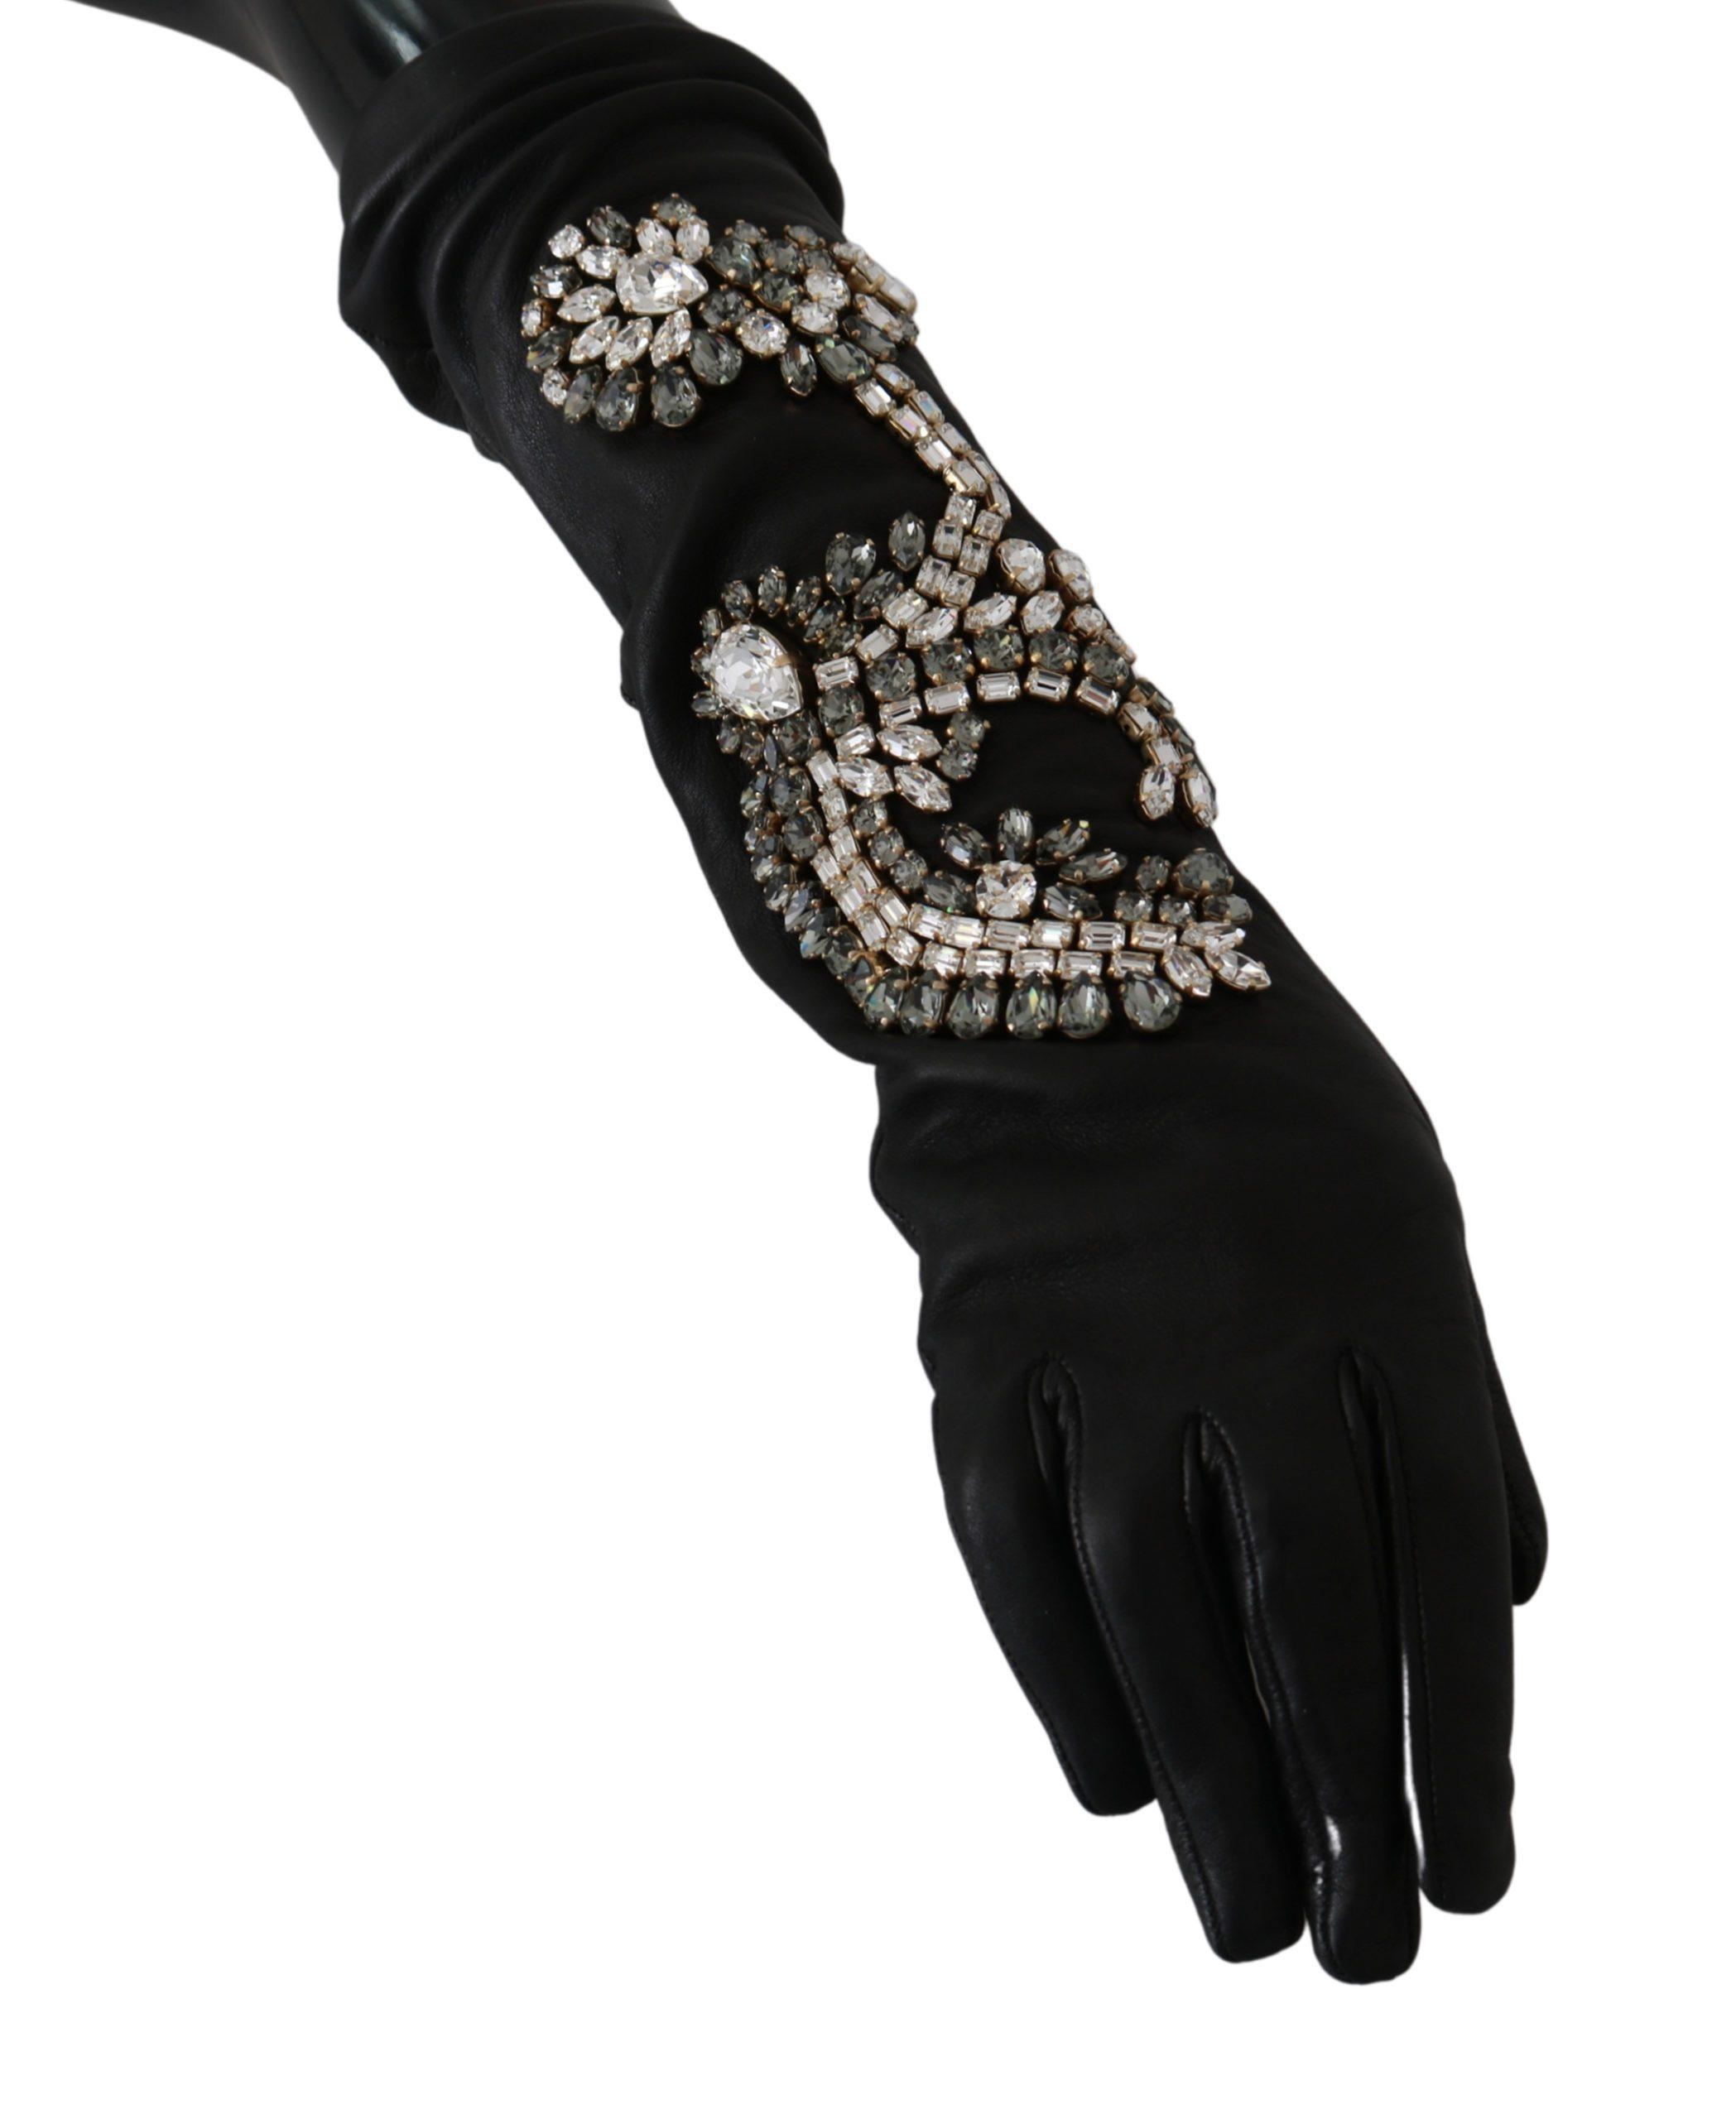 Dolce & Gabbana Women's Leather Lamb Skin Crystal Gloves Black LB1031 - 6.5|XS